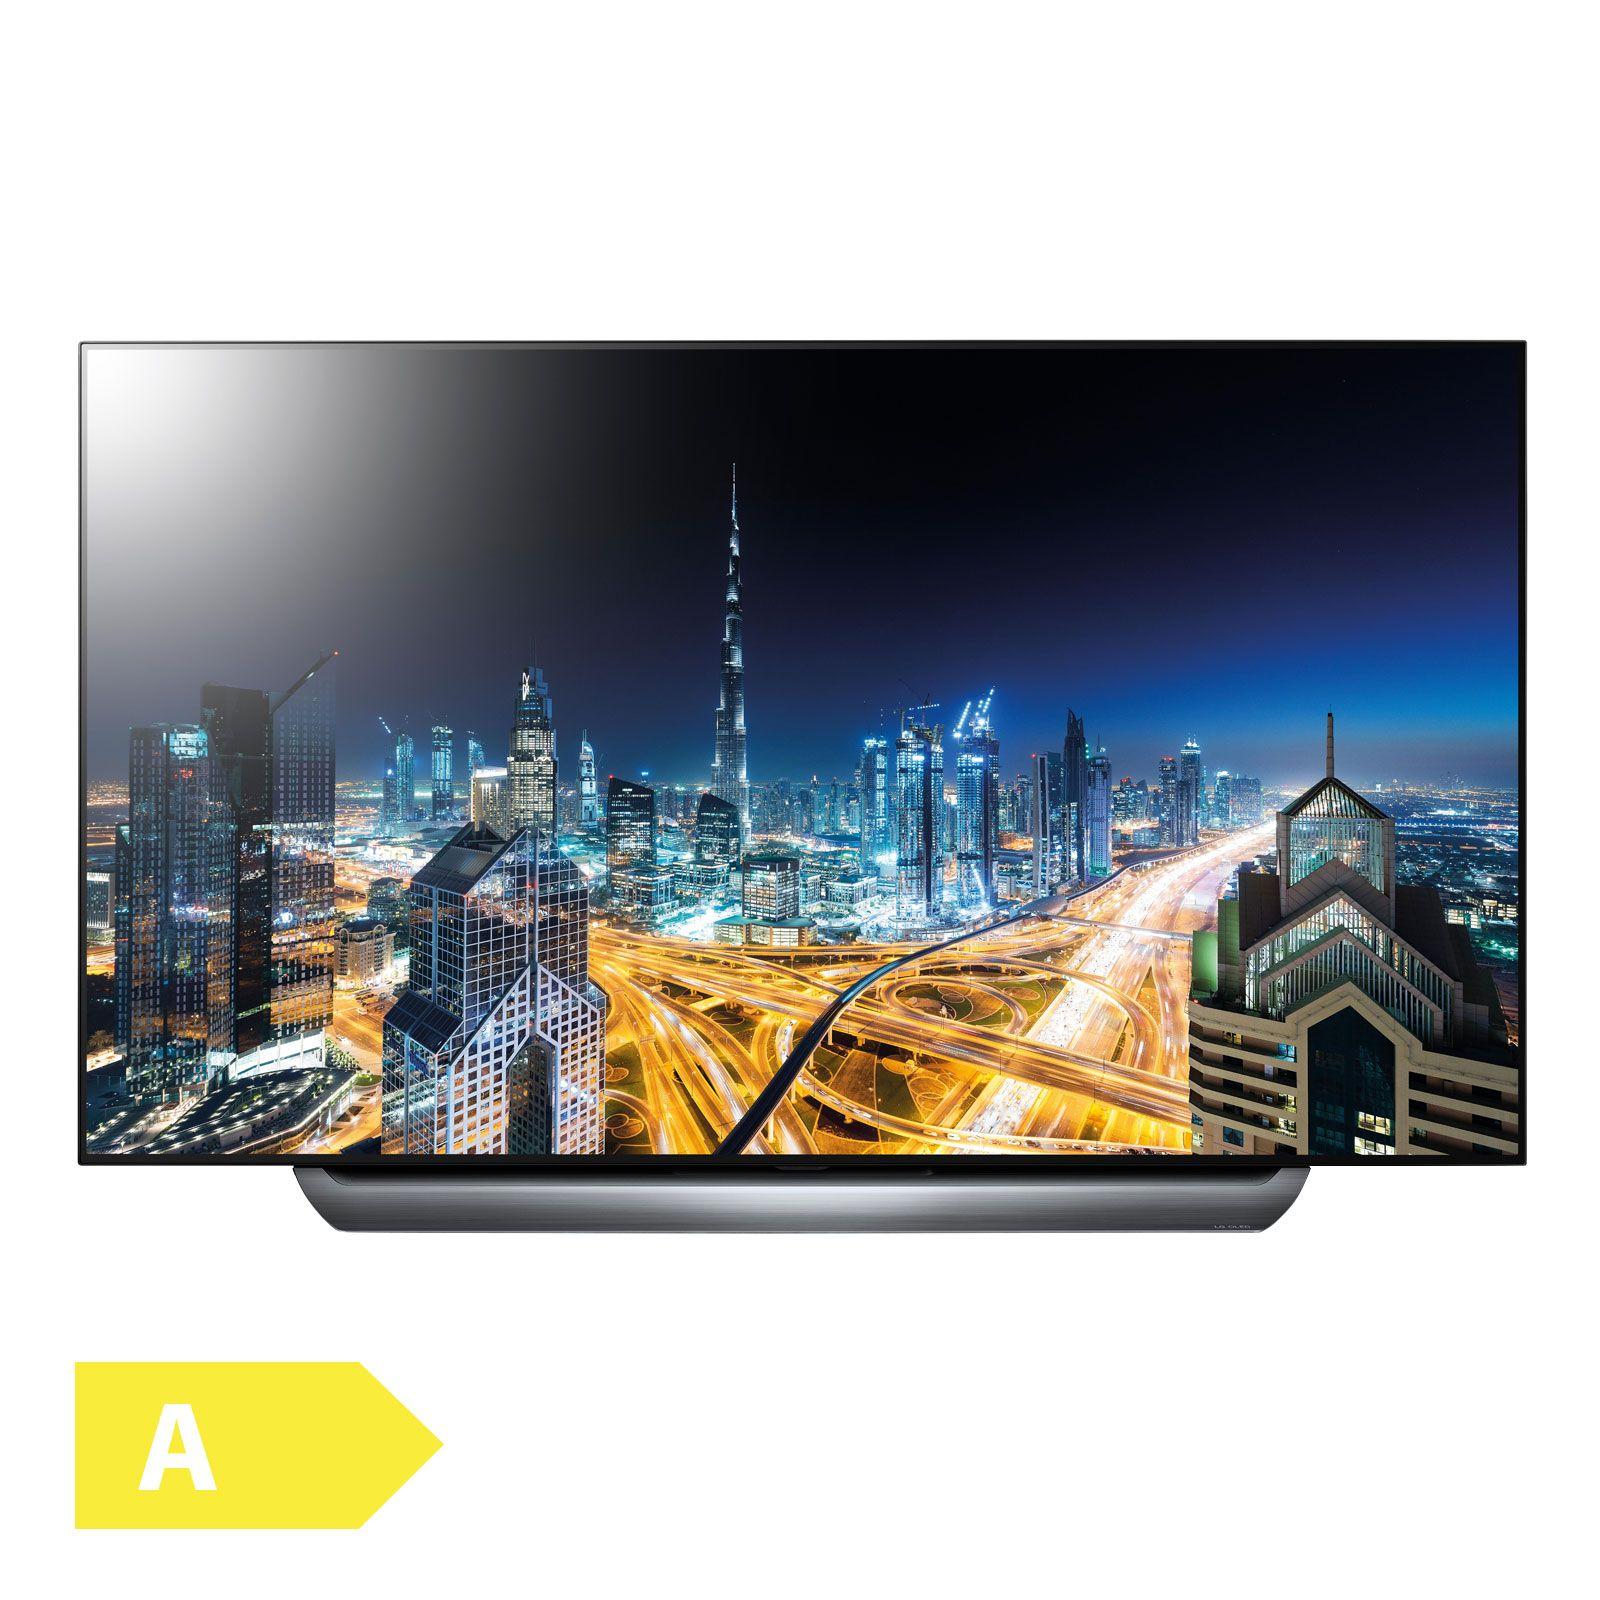 LG OLED65C8LLA, 164 CM (65 ZOLL), UHD 4K, SMART TV, OLED TV, DVB-T2 HD, DVB-C, DVB-S, DVB-S2